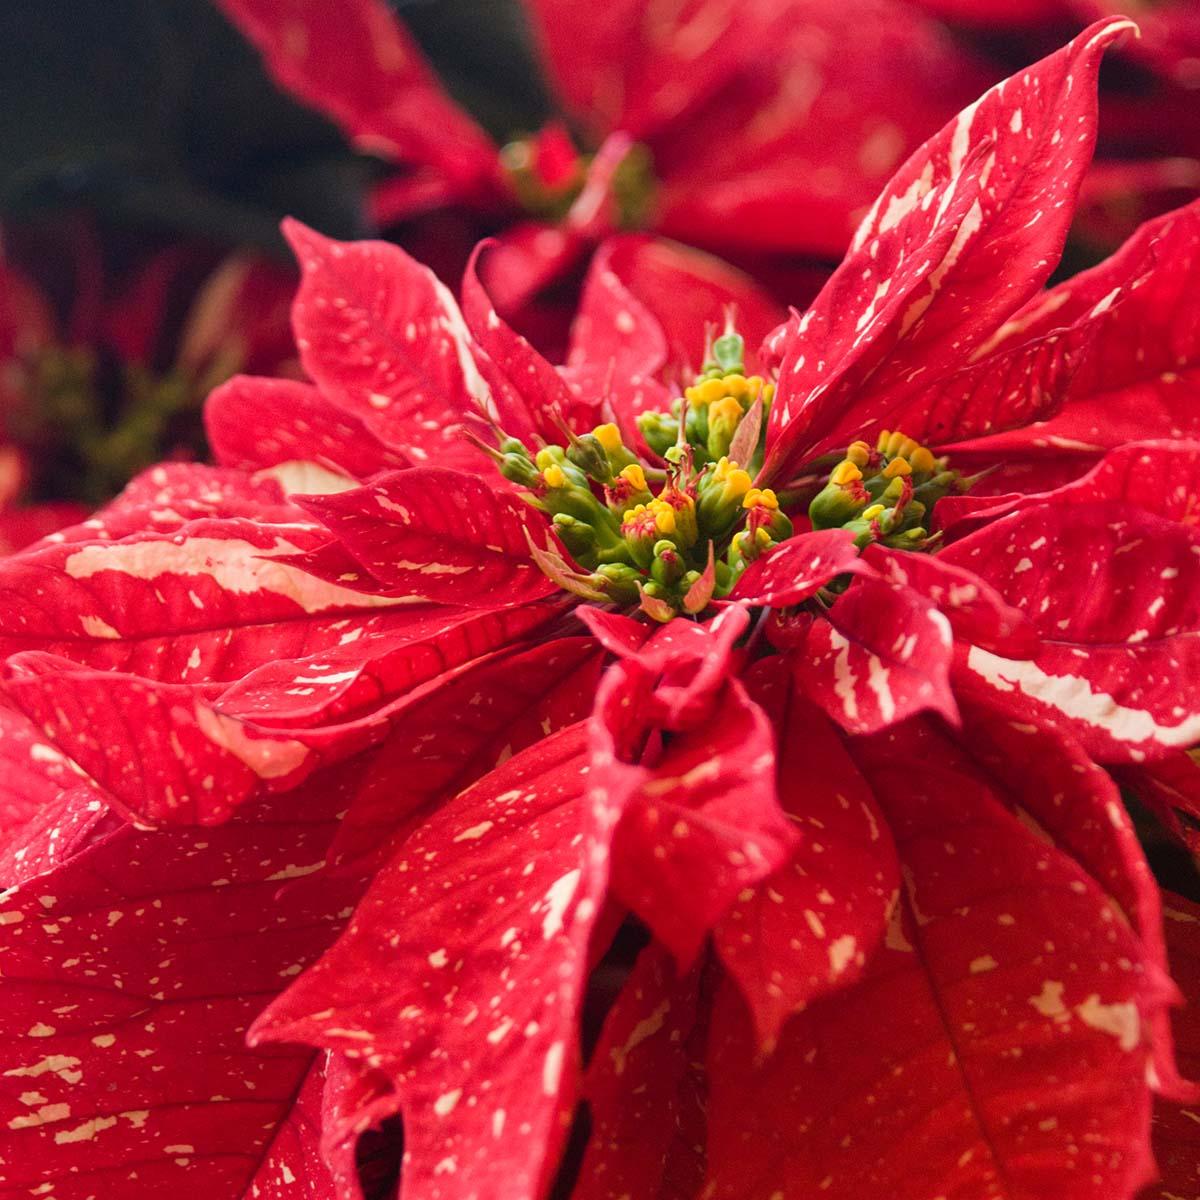 PHOTO: Red Glitter poinsettia (Euphorbia pulcherrima 'Red Glitter').